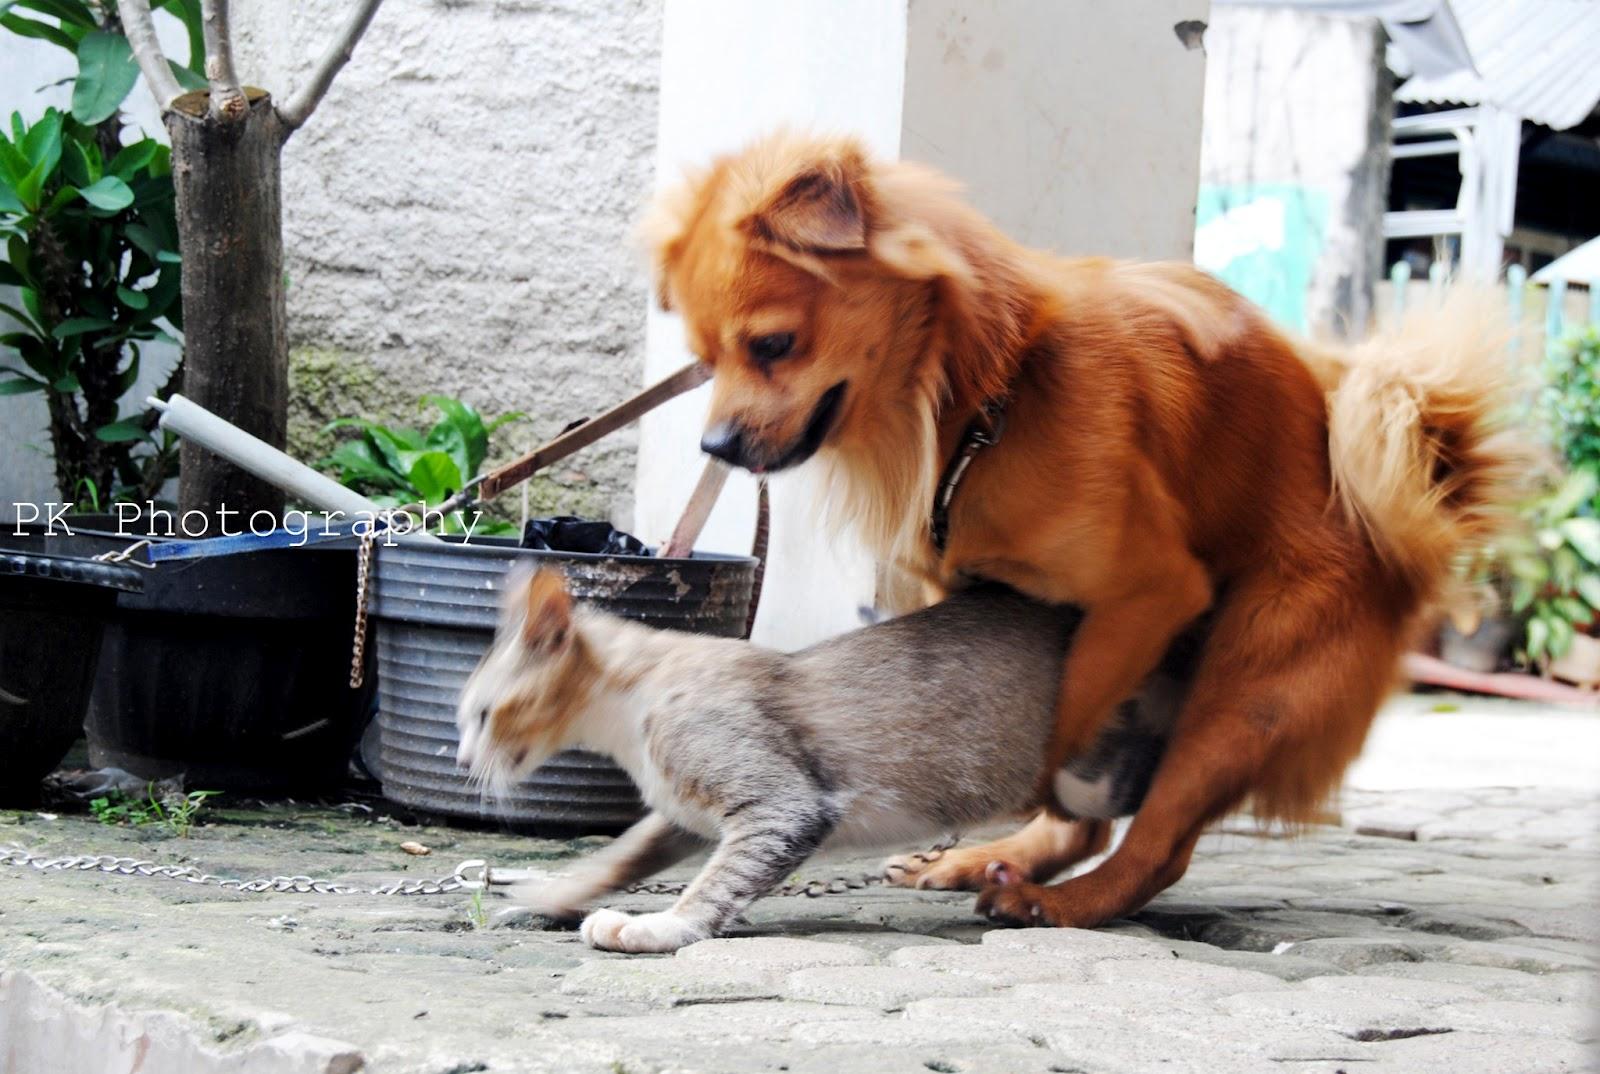 gambar kucing - gambar kucing kawin